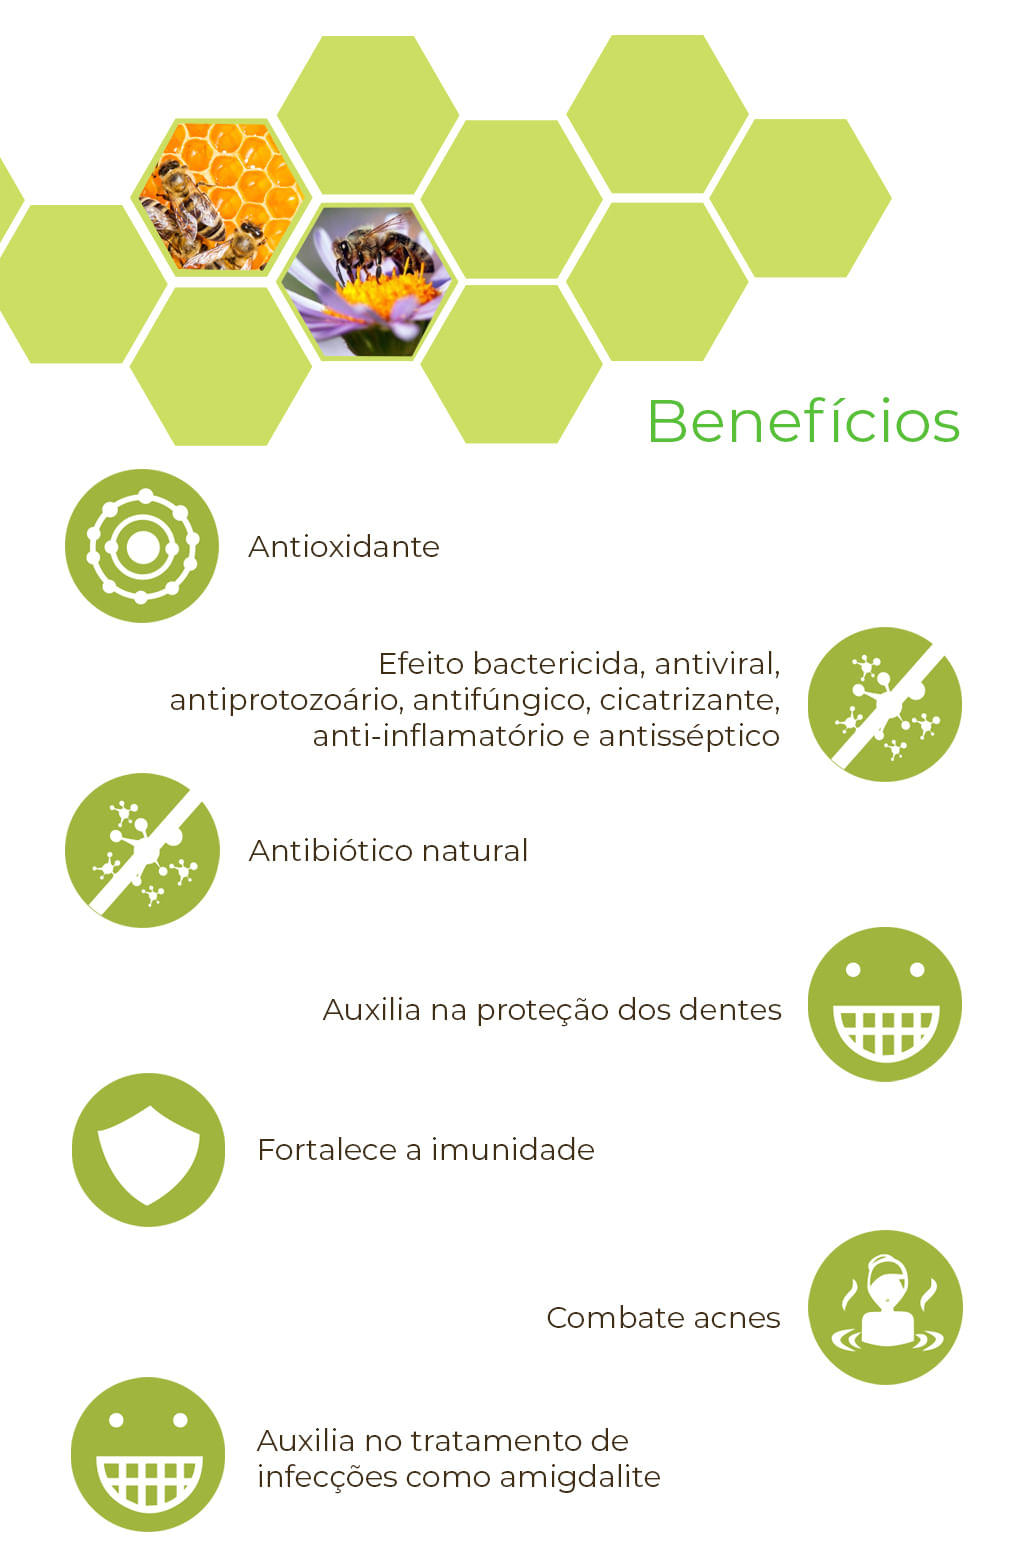 Extrato de Própolis 11% 30ml - Wax Green - Projeto Verao